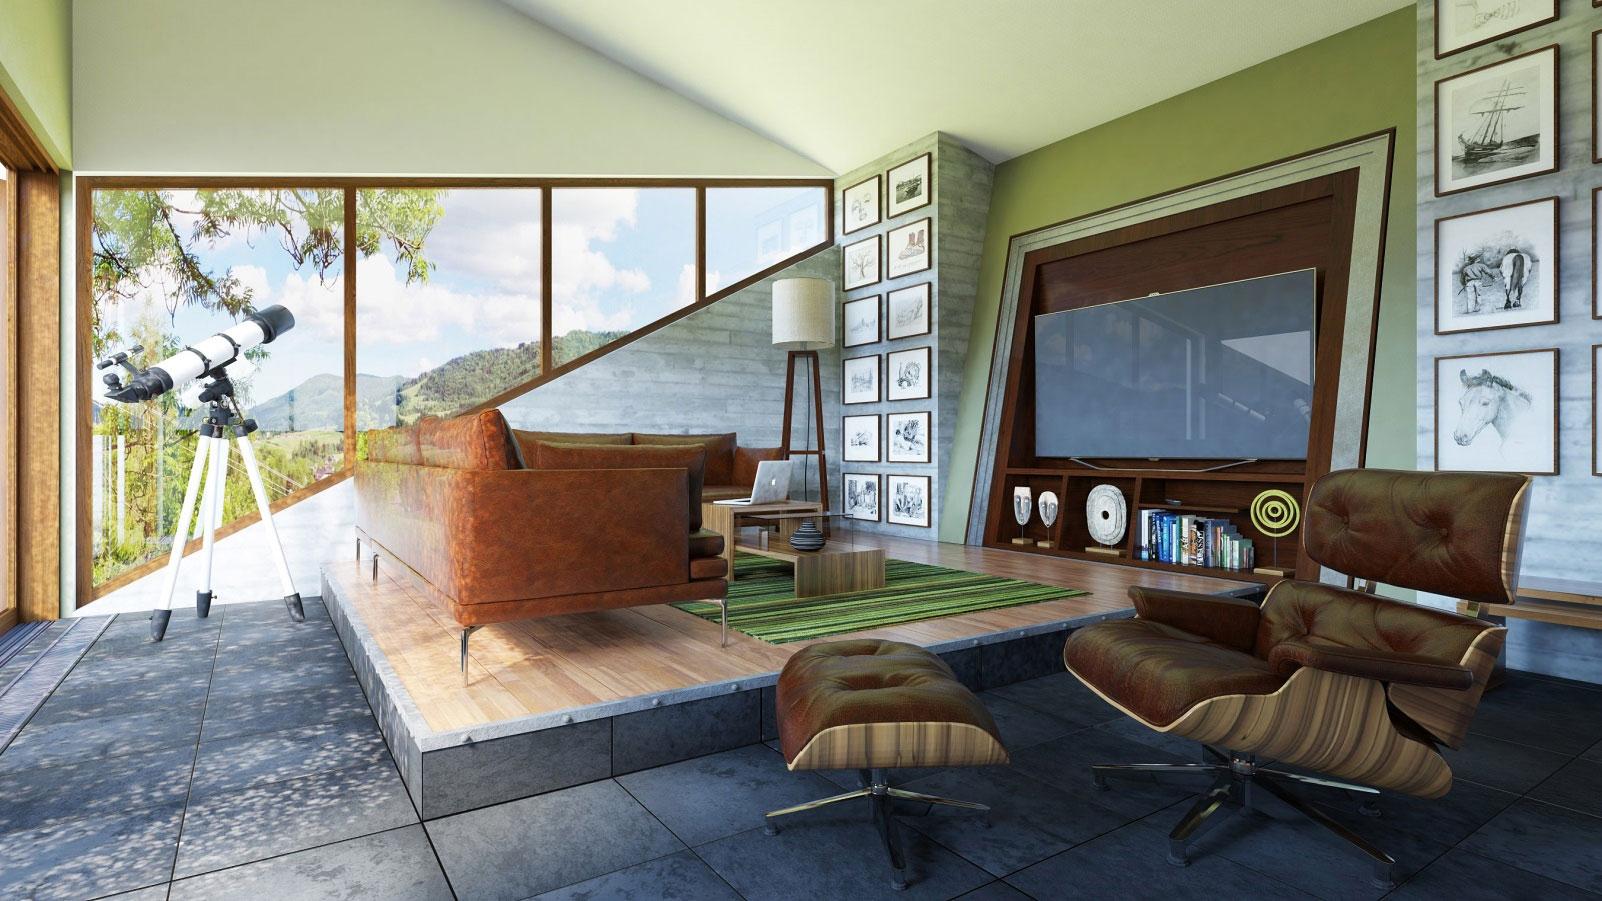 3d modeling tutorial 3d animation tutorial tutorial sketchup 7 interior design of a living room